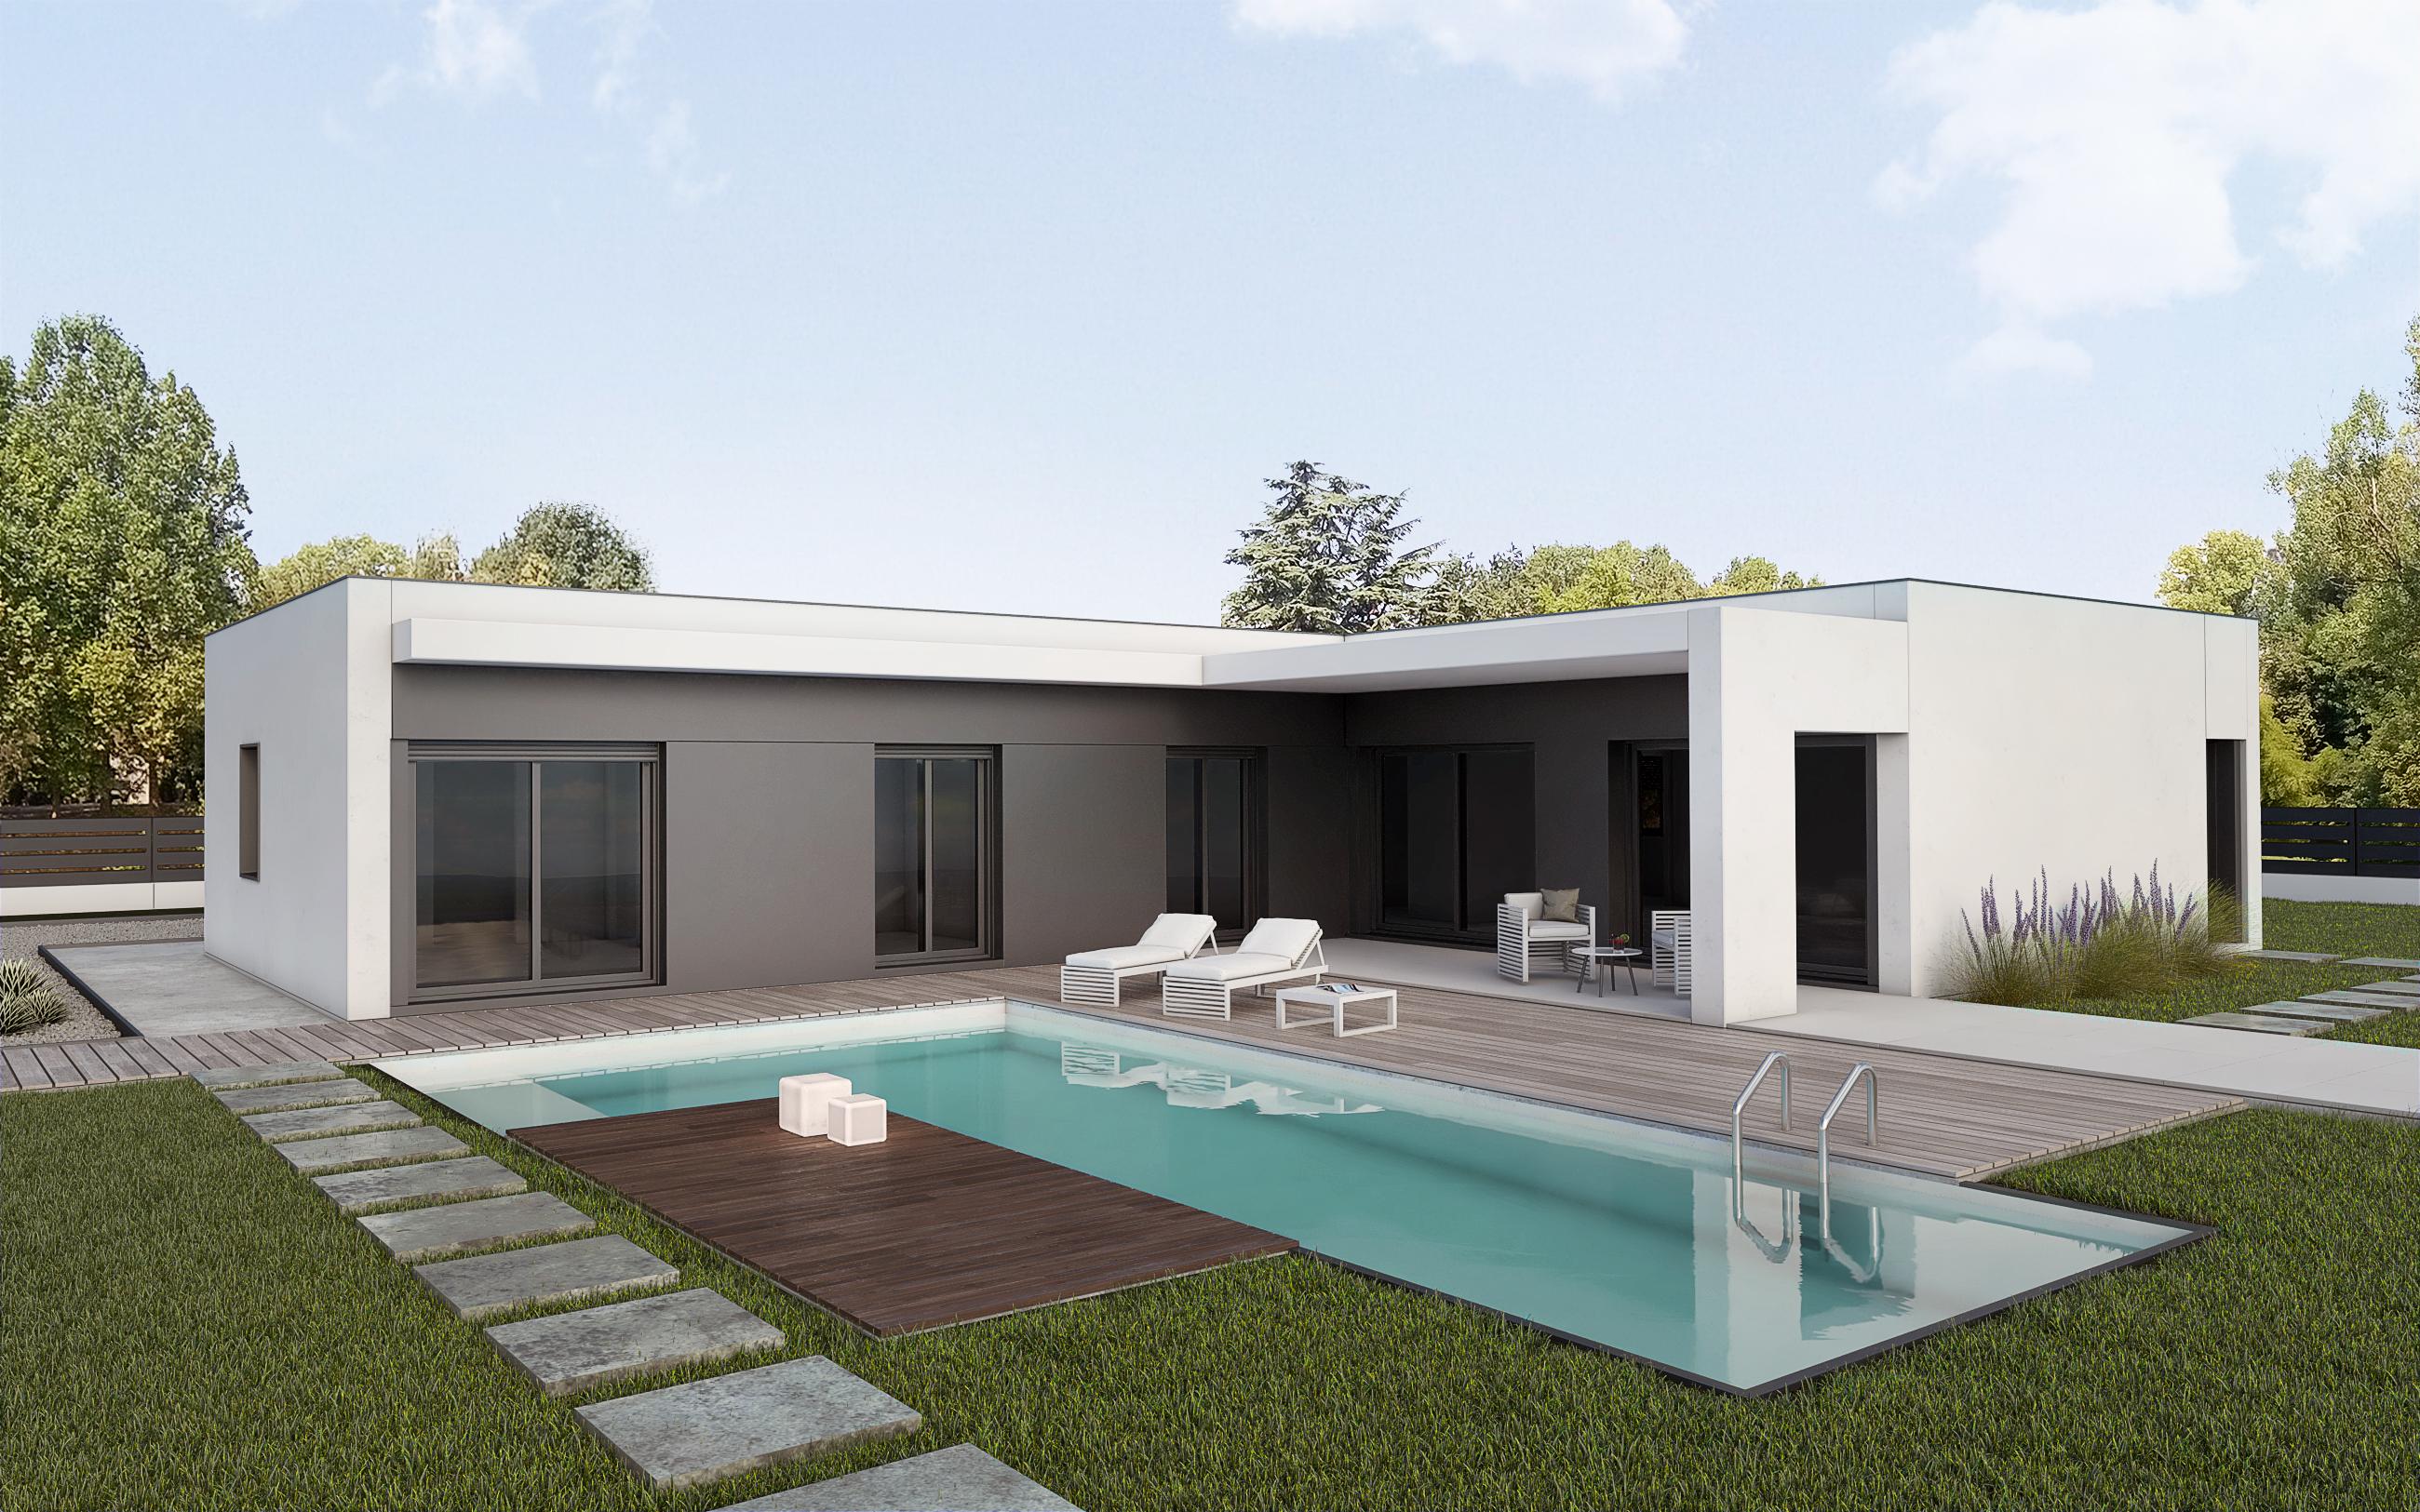 Hormipresa Casas Prefabricadas Hormigon Precios Caracteristicas Etc